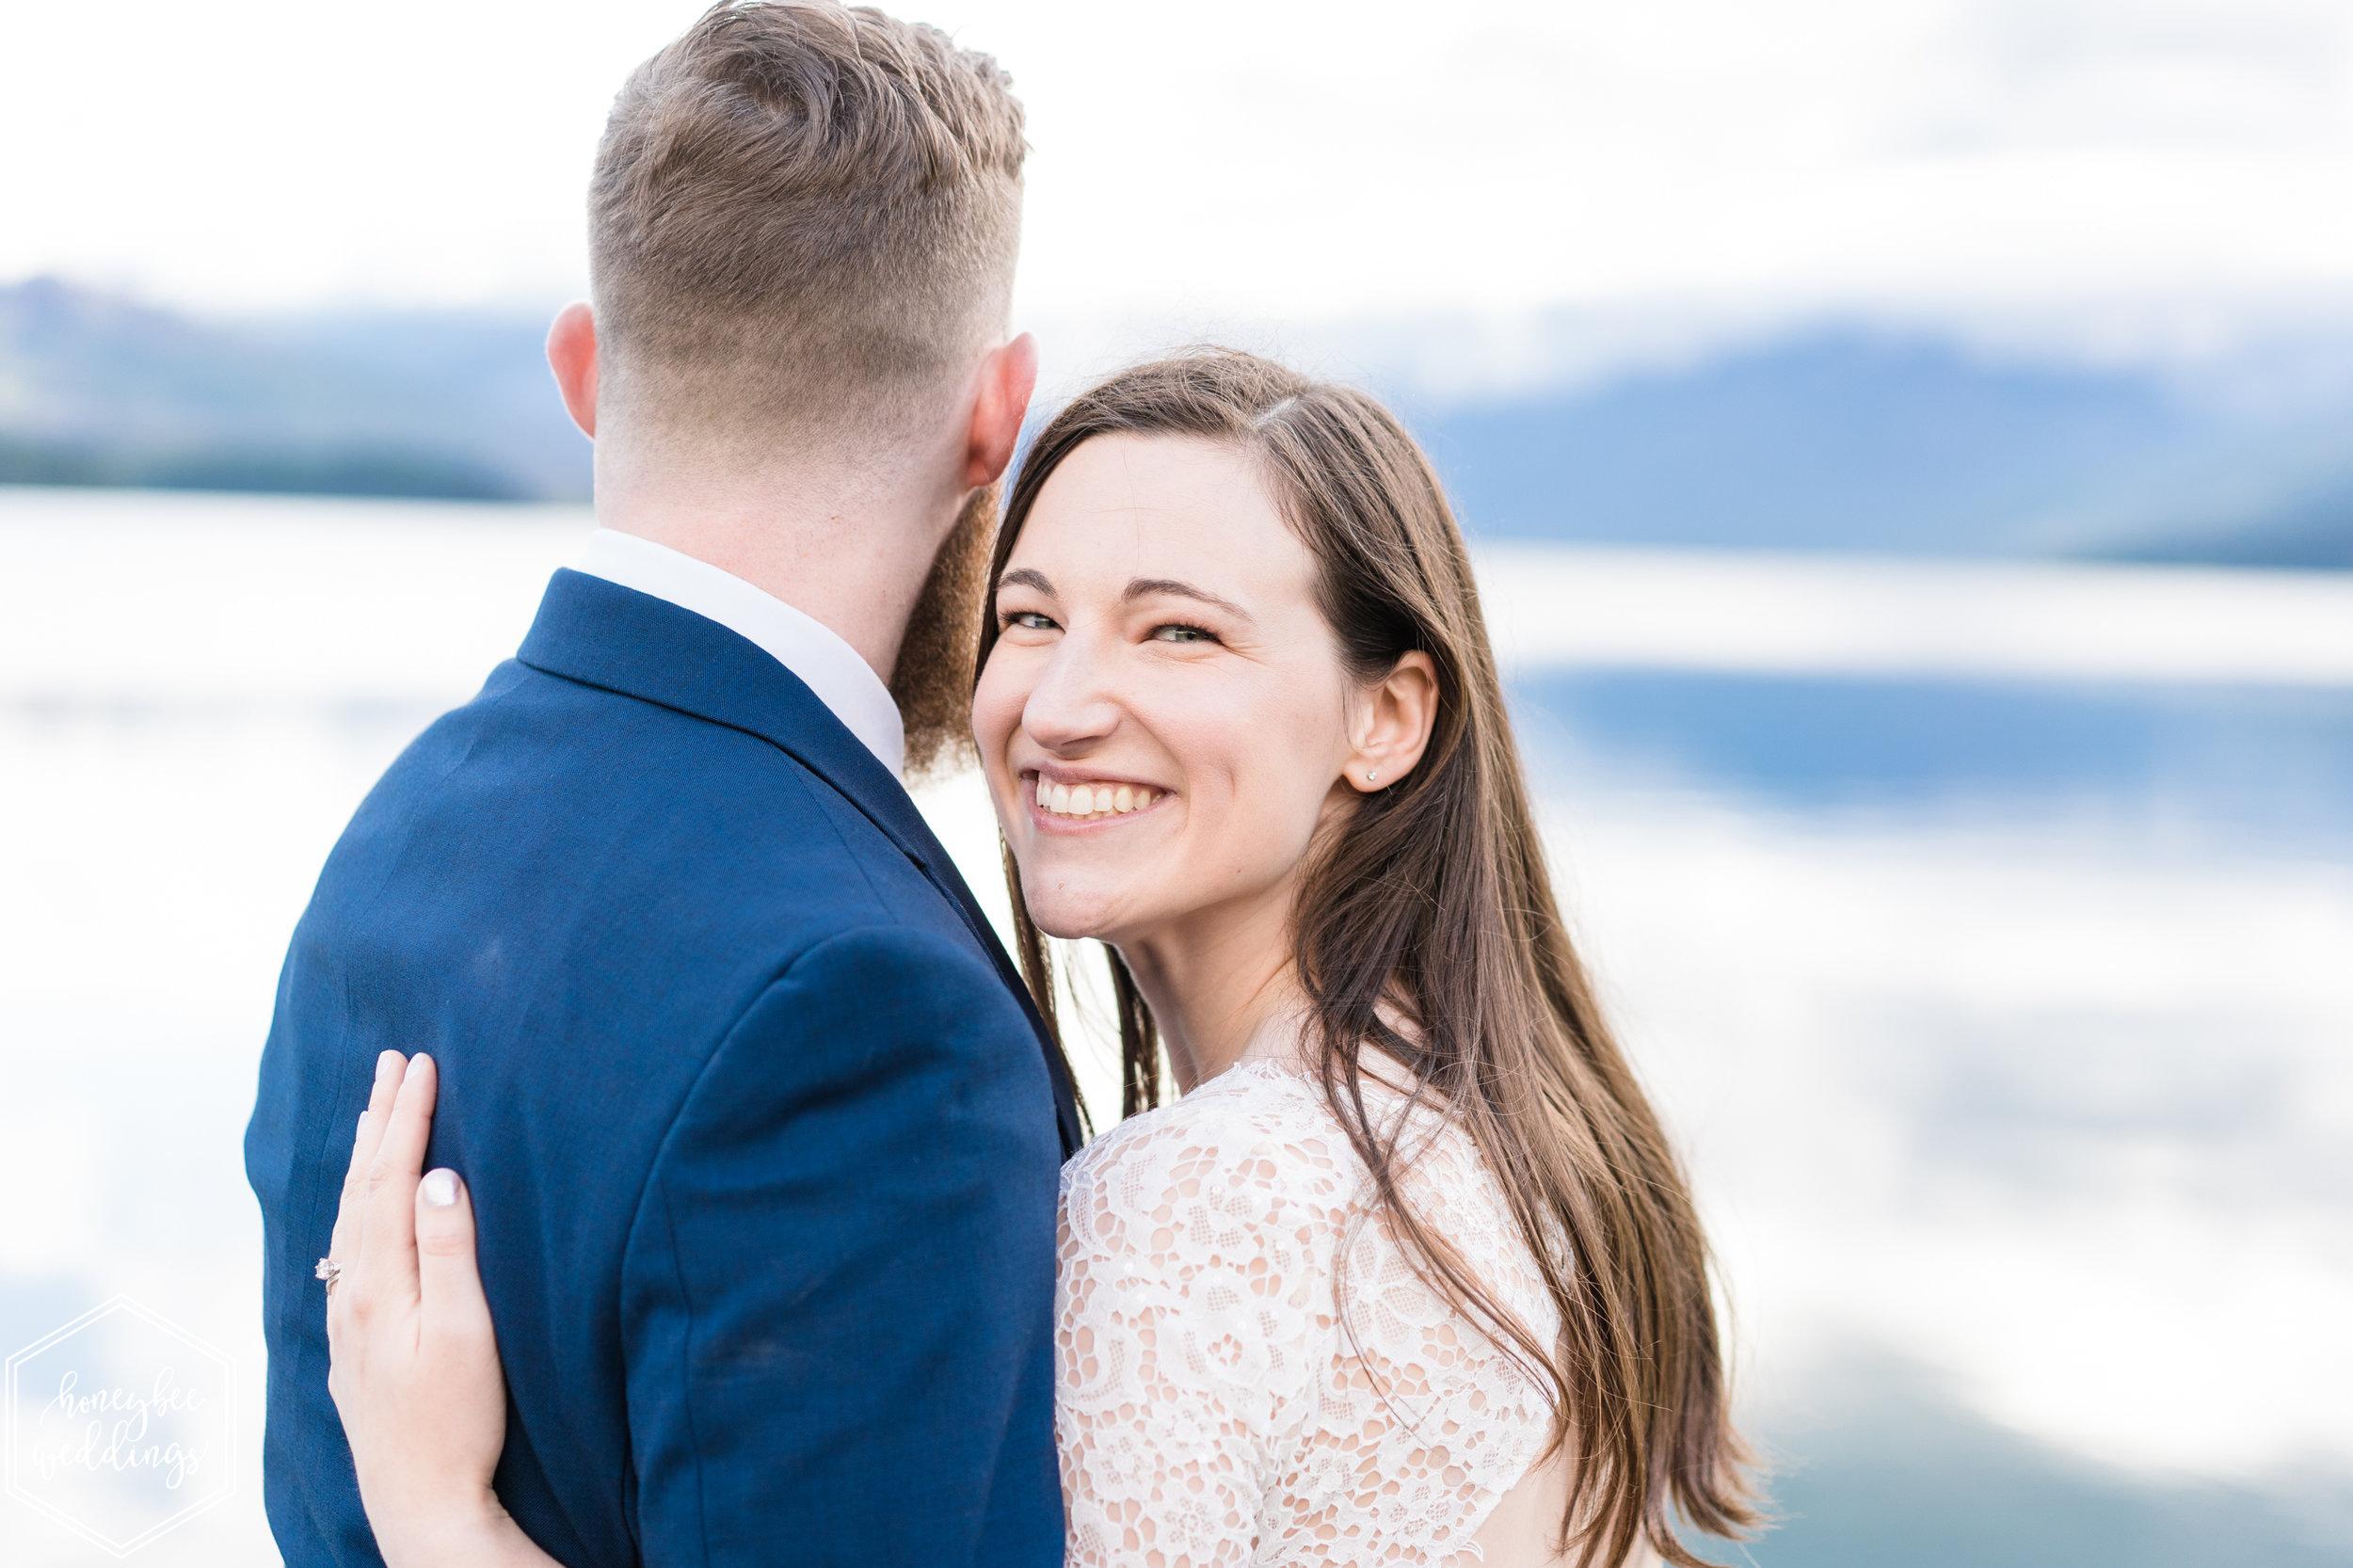 235Glacier National Park Wedding_Izaak Walton Inn Wedding_Honeybee Weddings_Norah & Kyle_June 09, 2019-58.jpg